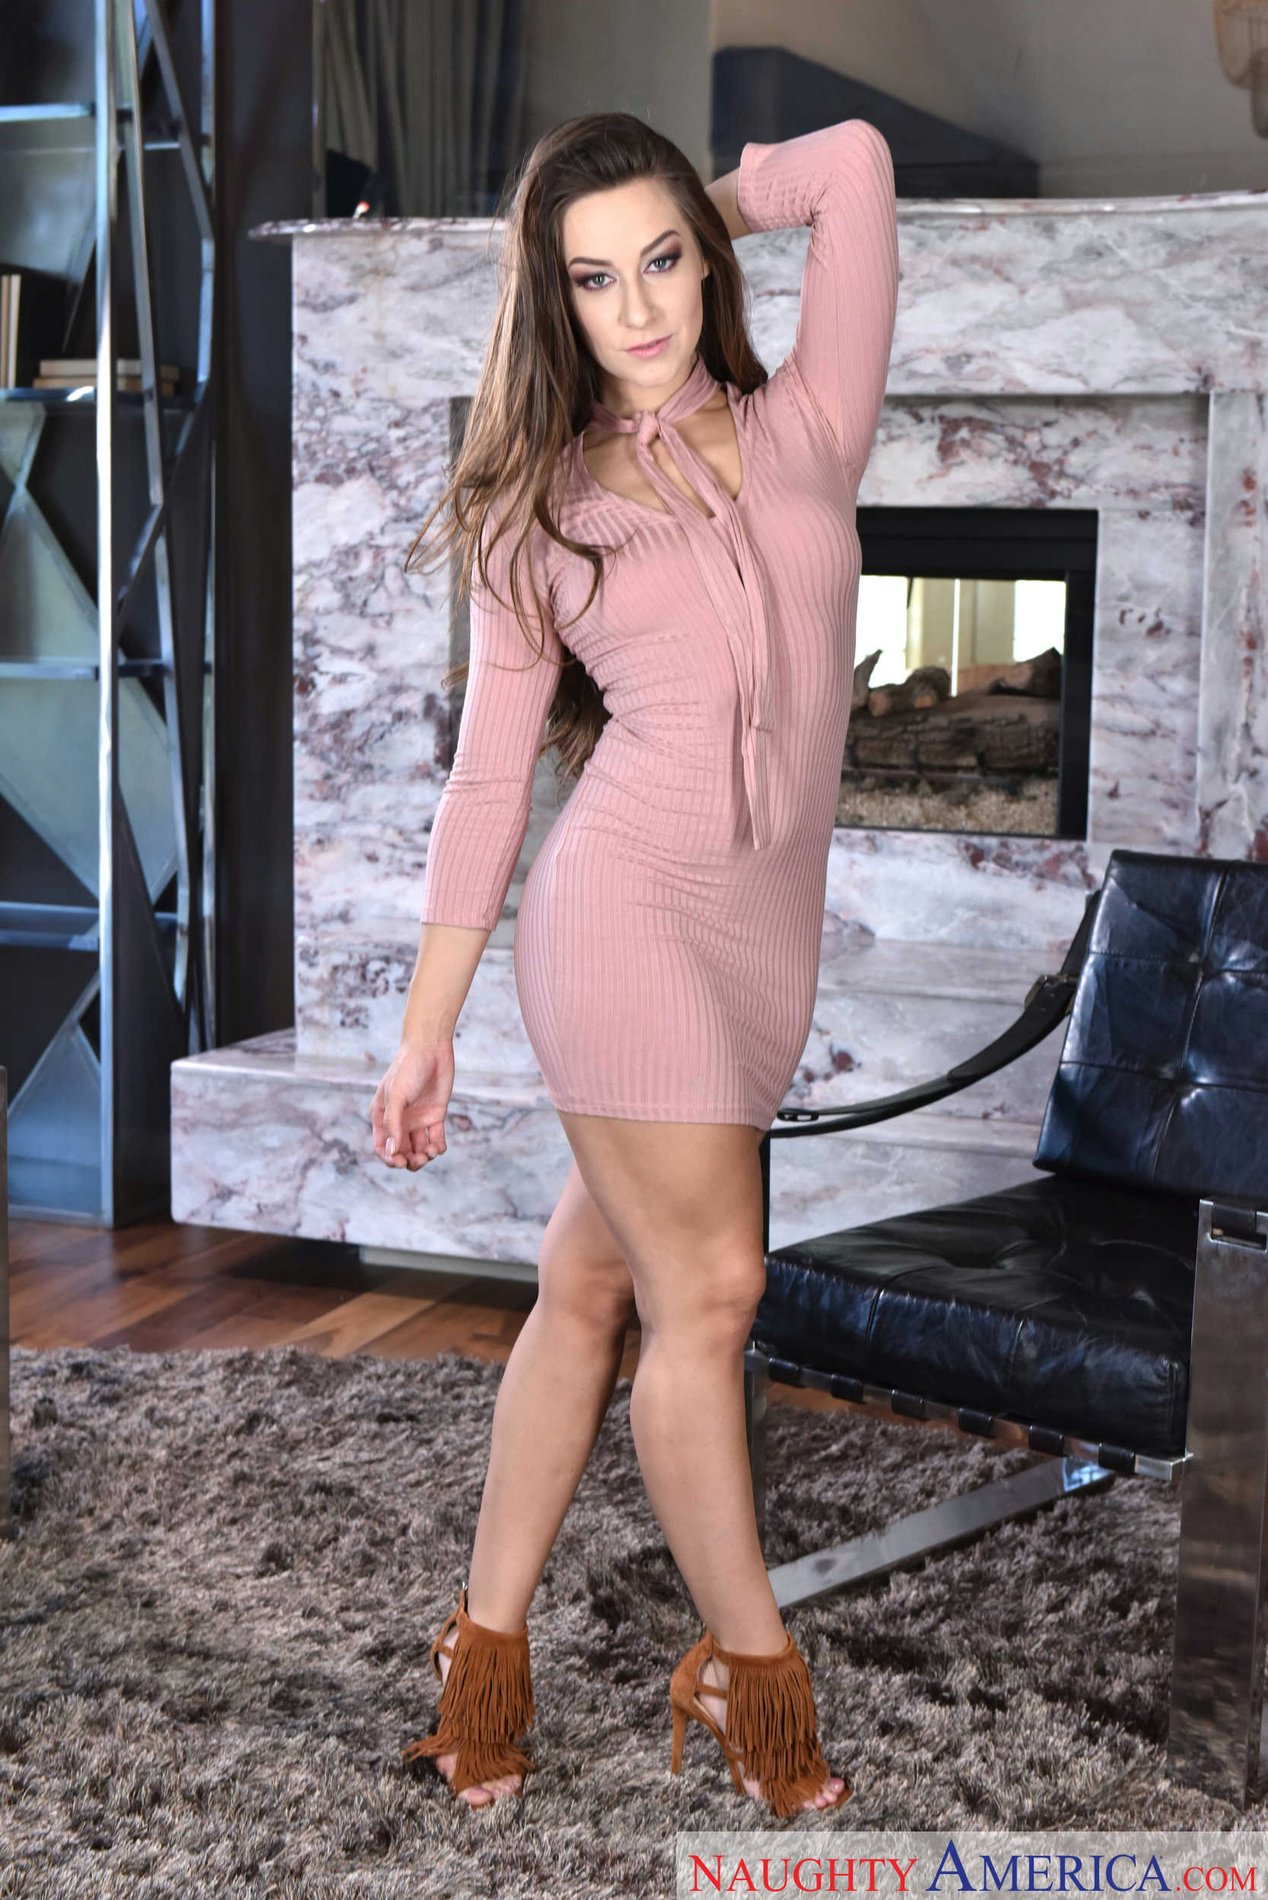 Jessica simpson porn sperm